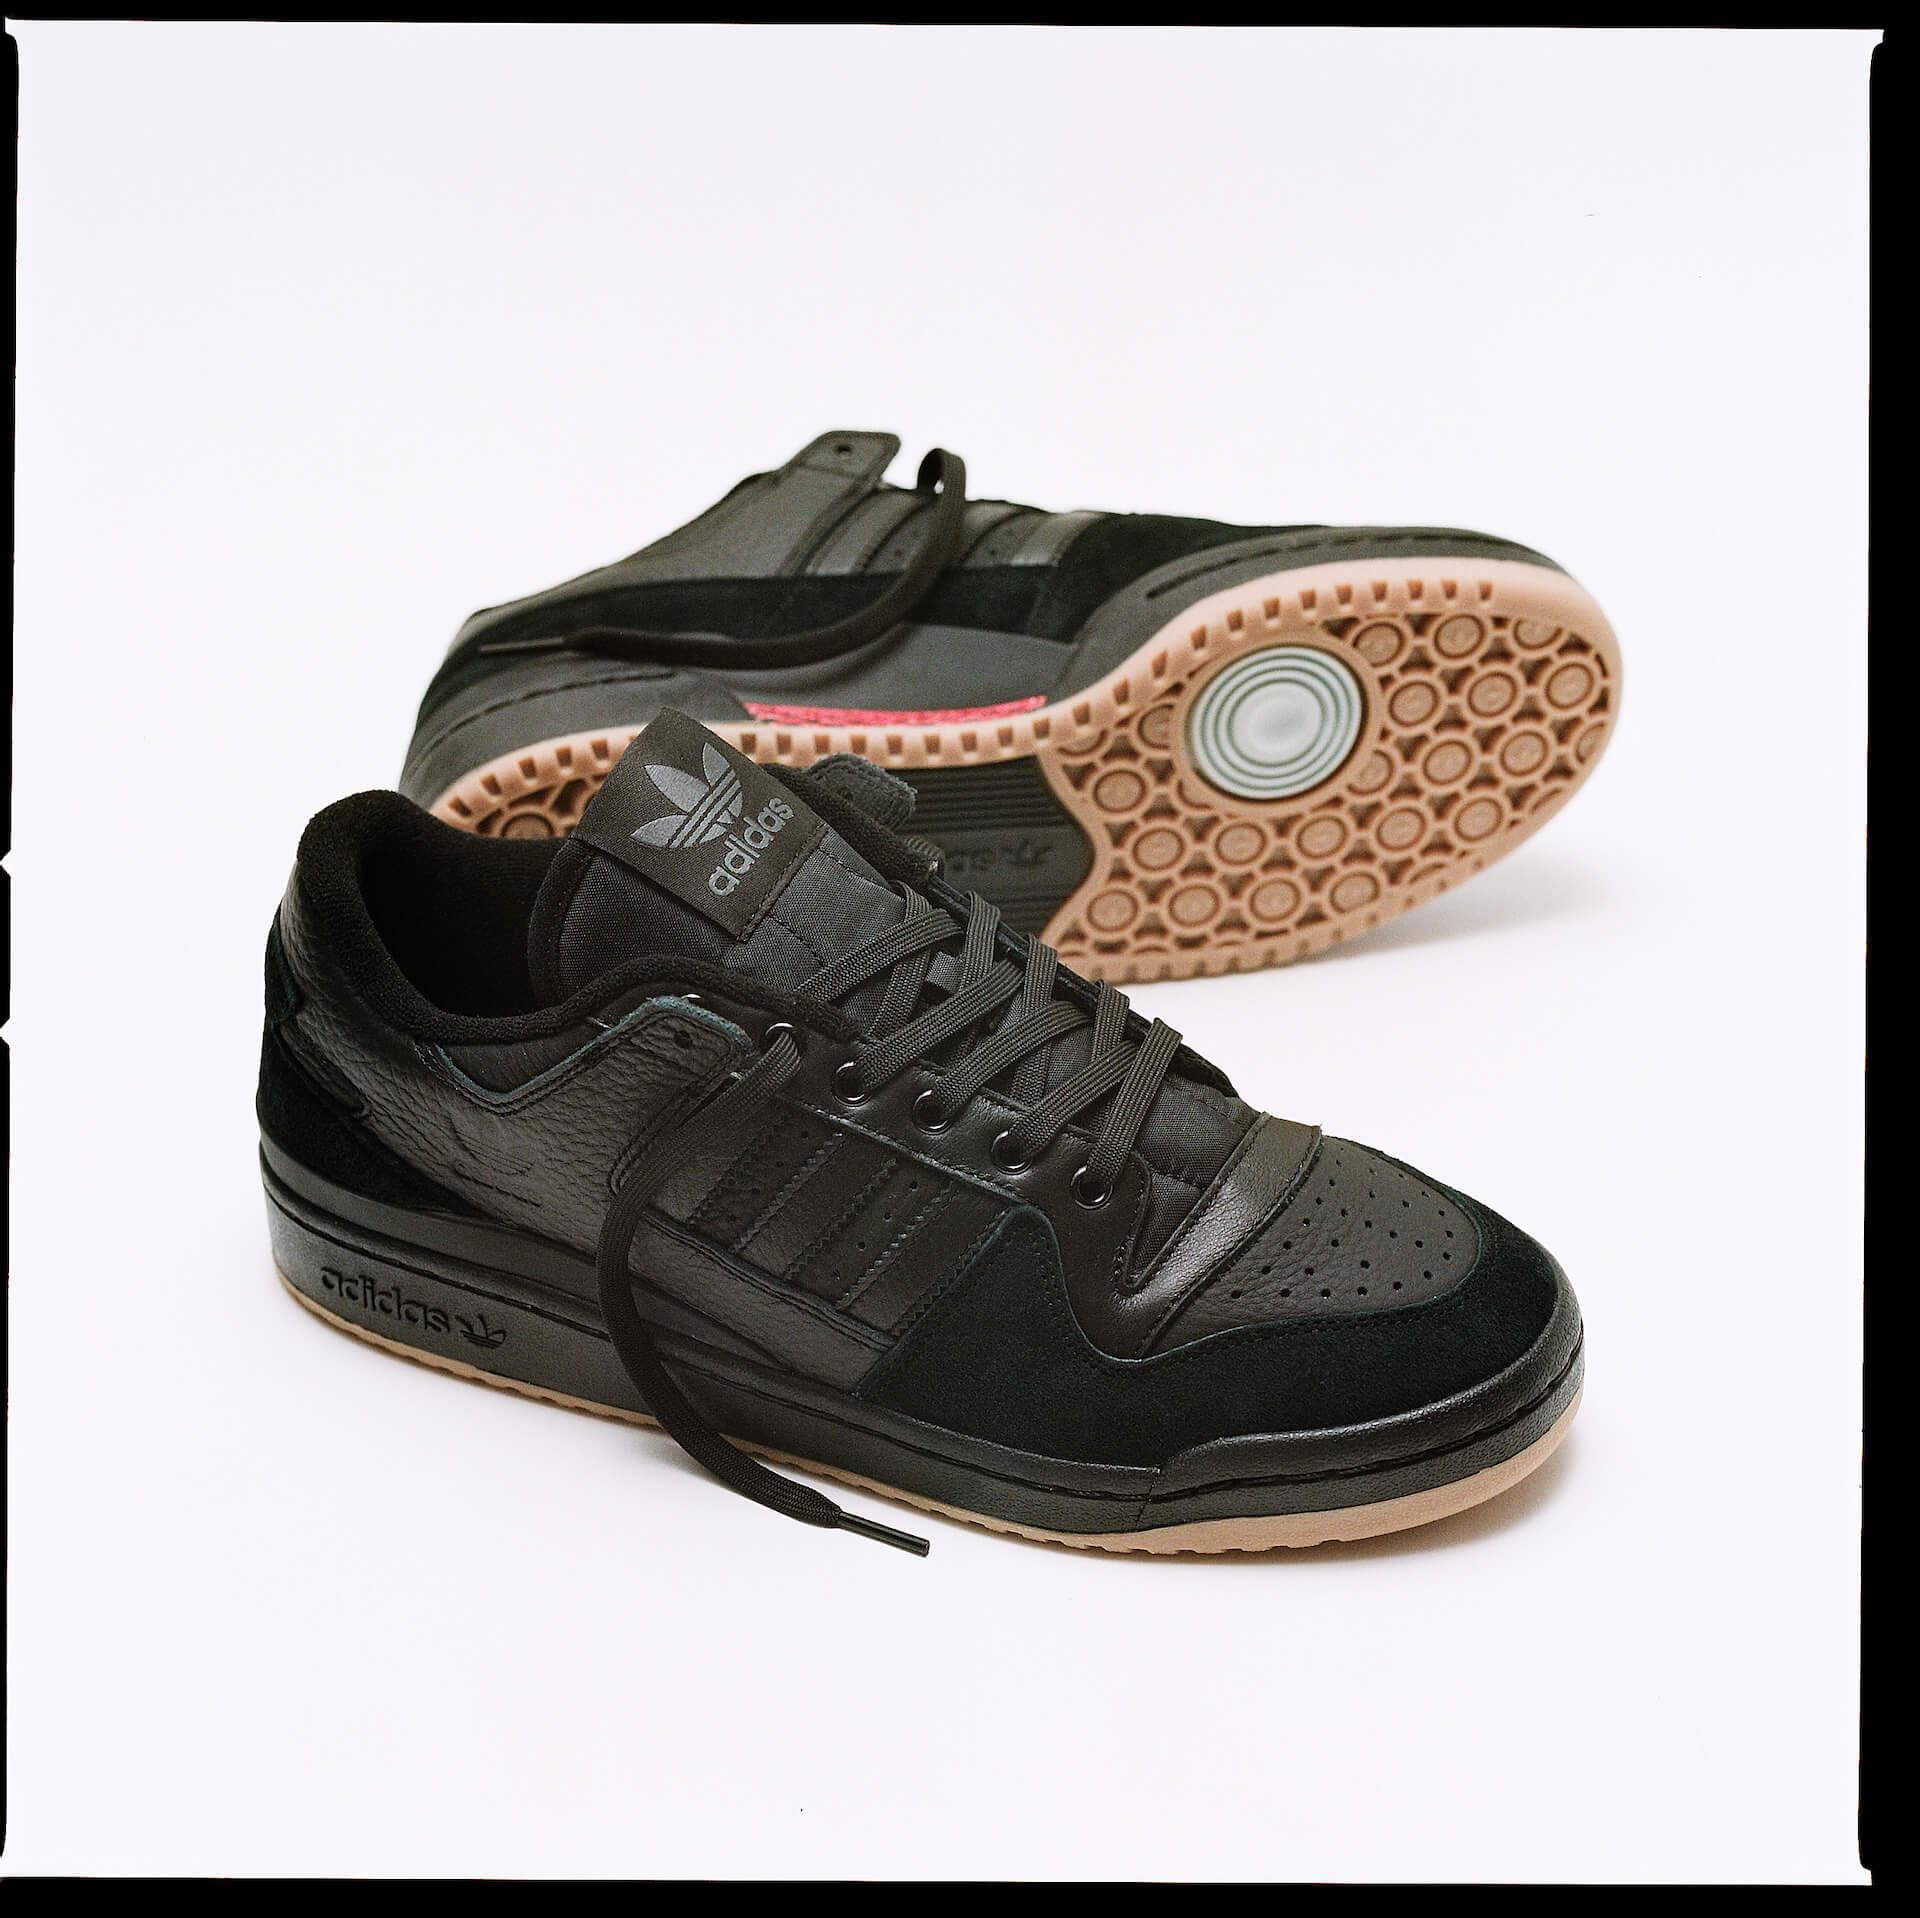 adidas Skateboarding「FORUM 84 ADV」に春夏仕様の新色が登場!チョークホワイト&ブラックの2色 life210324_adidasskateboarding_1